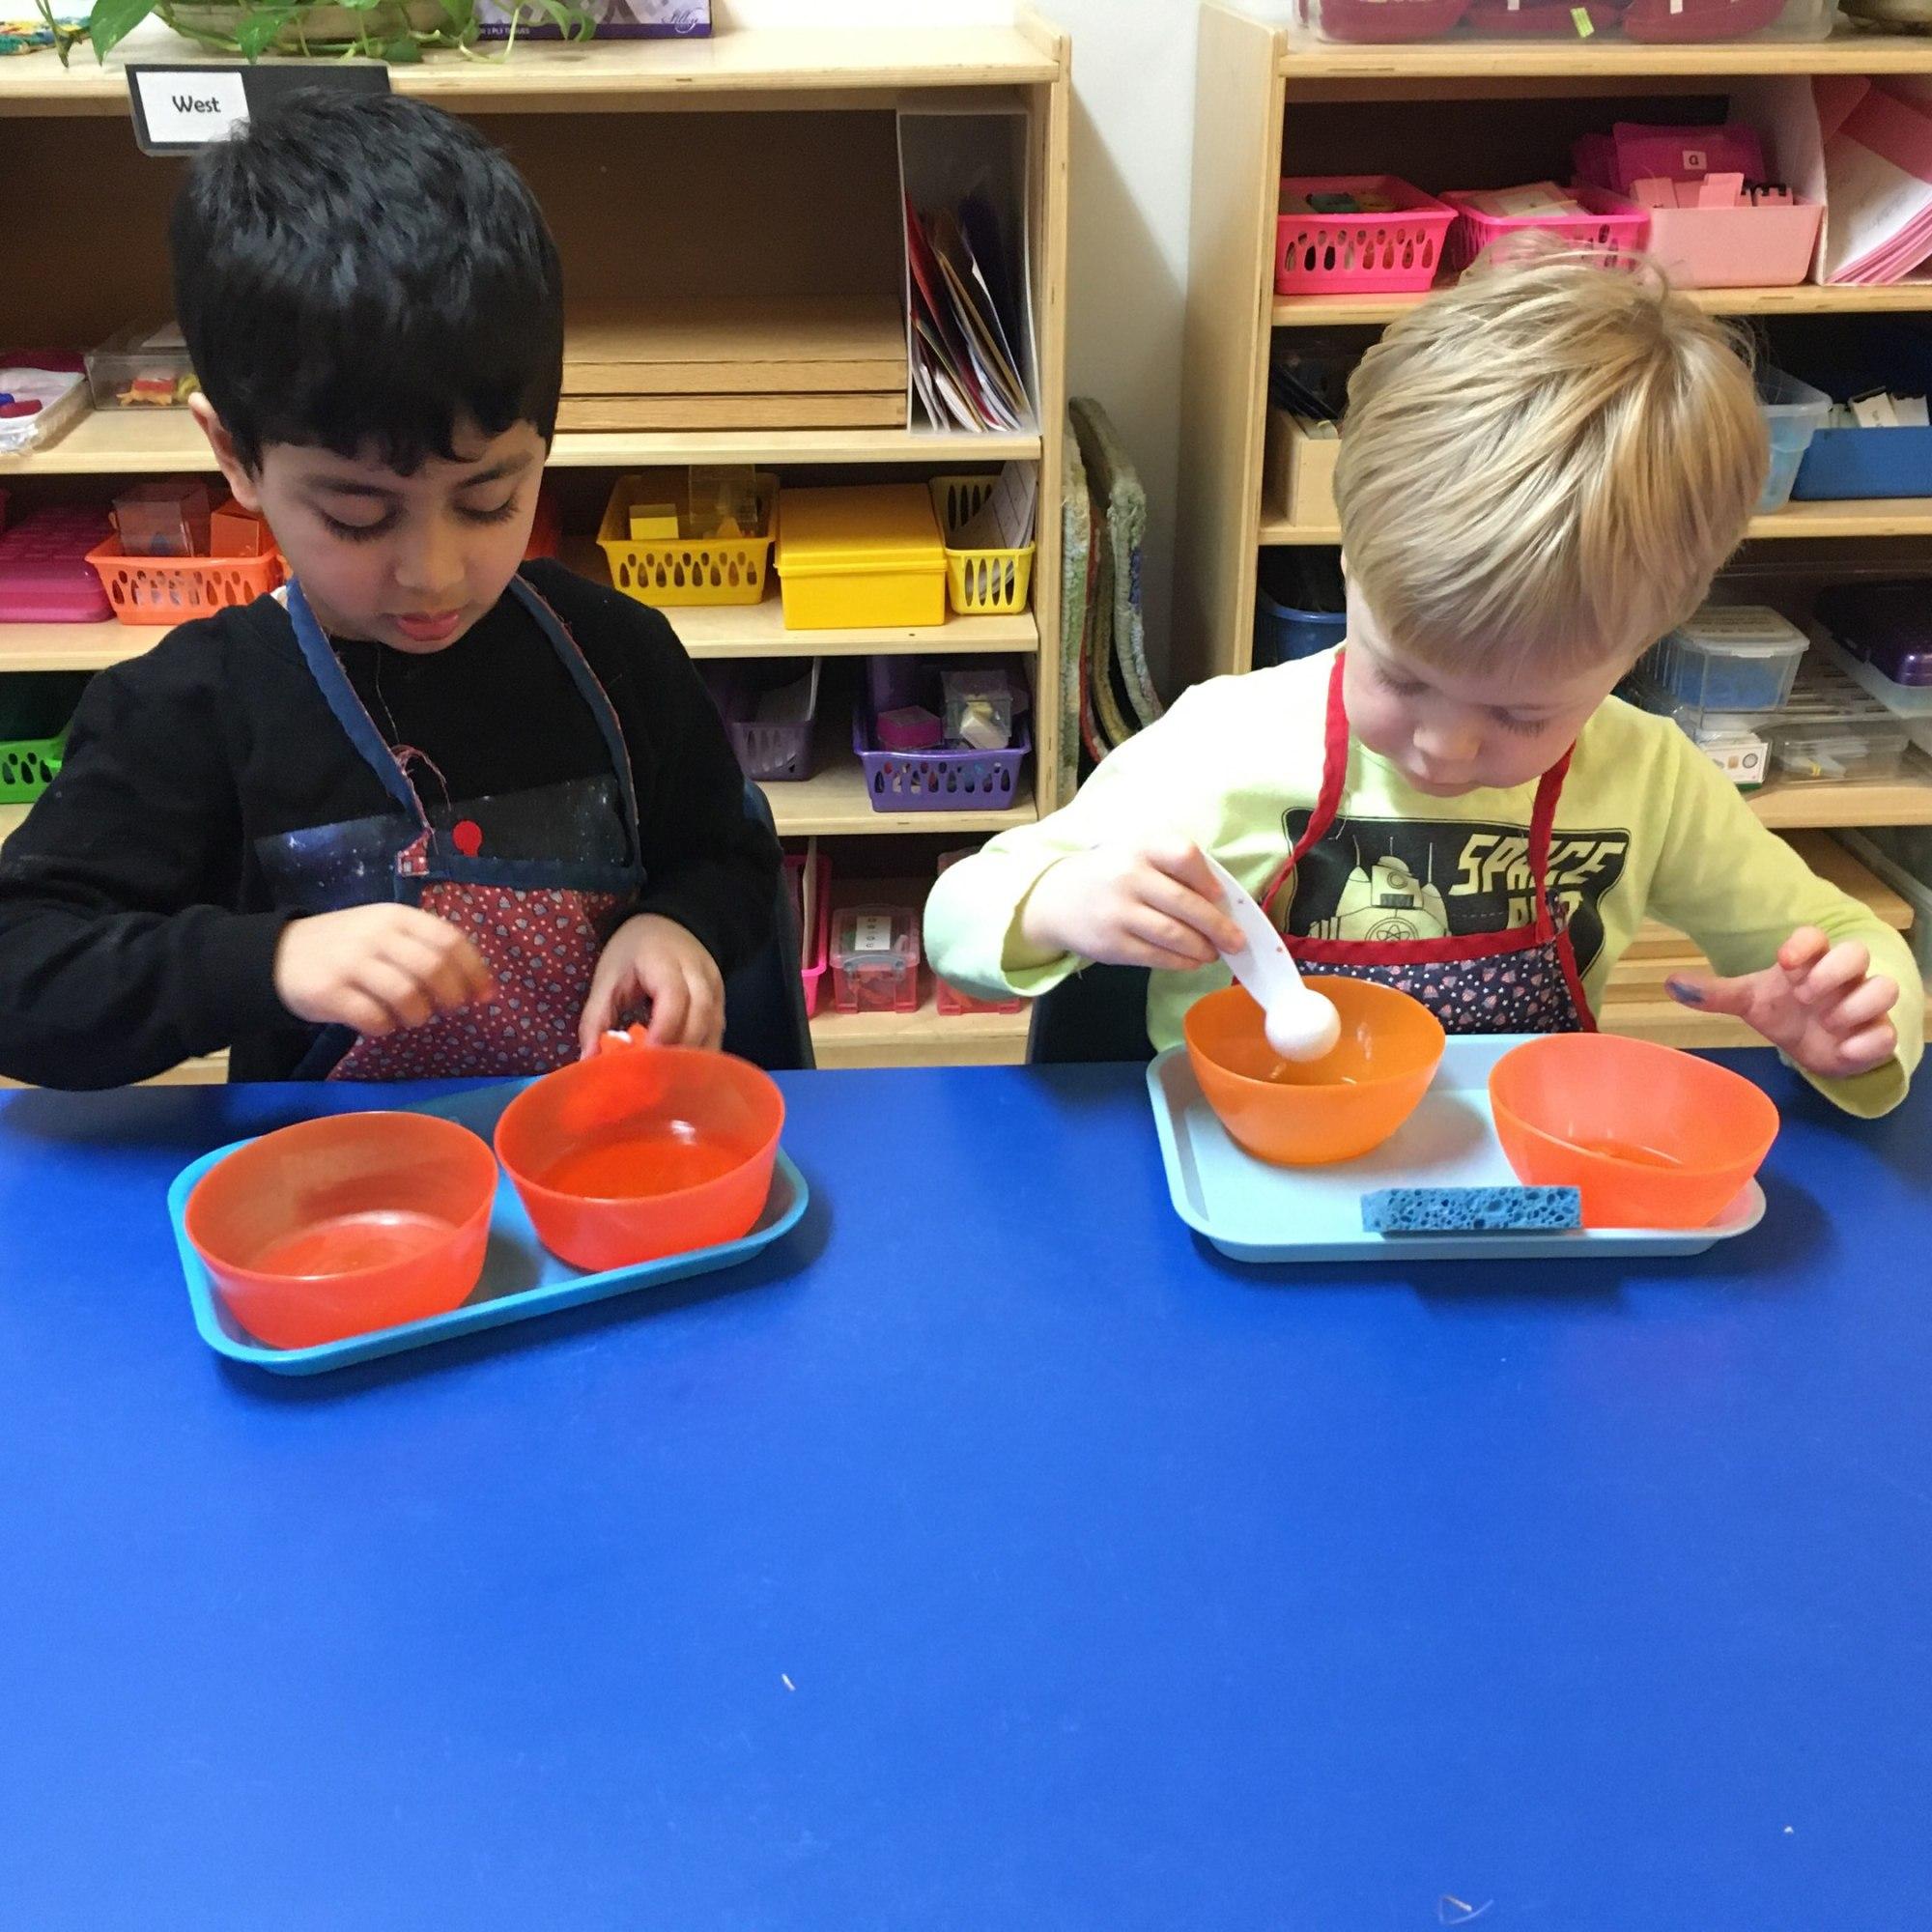 Two children using pouring materials at Children's House Montessori school.